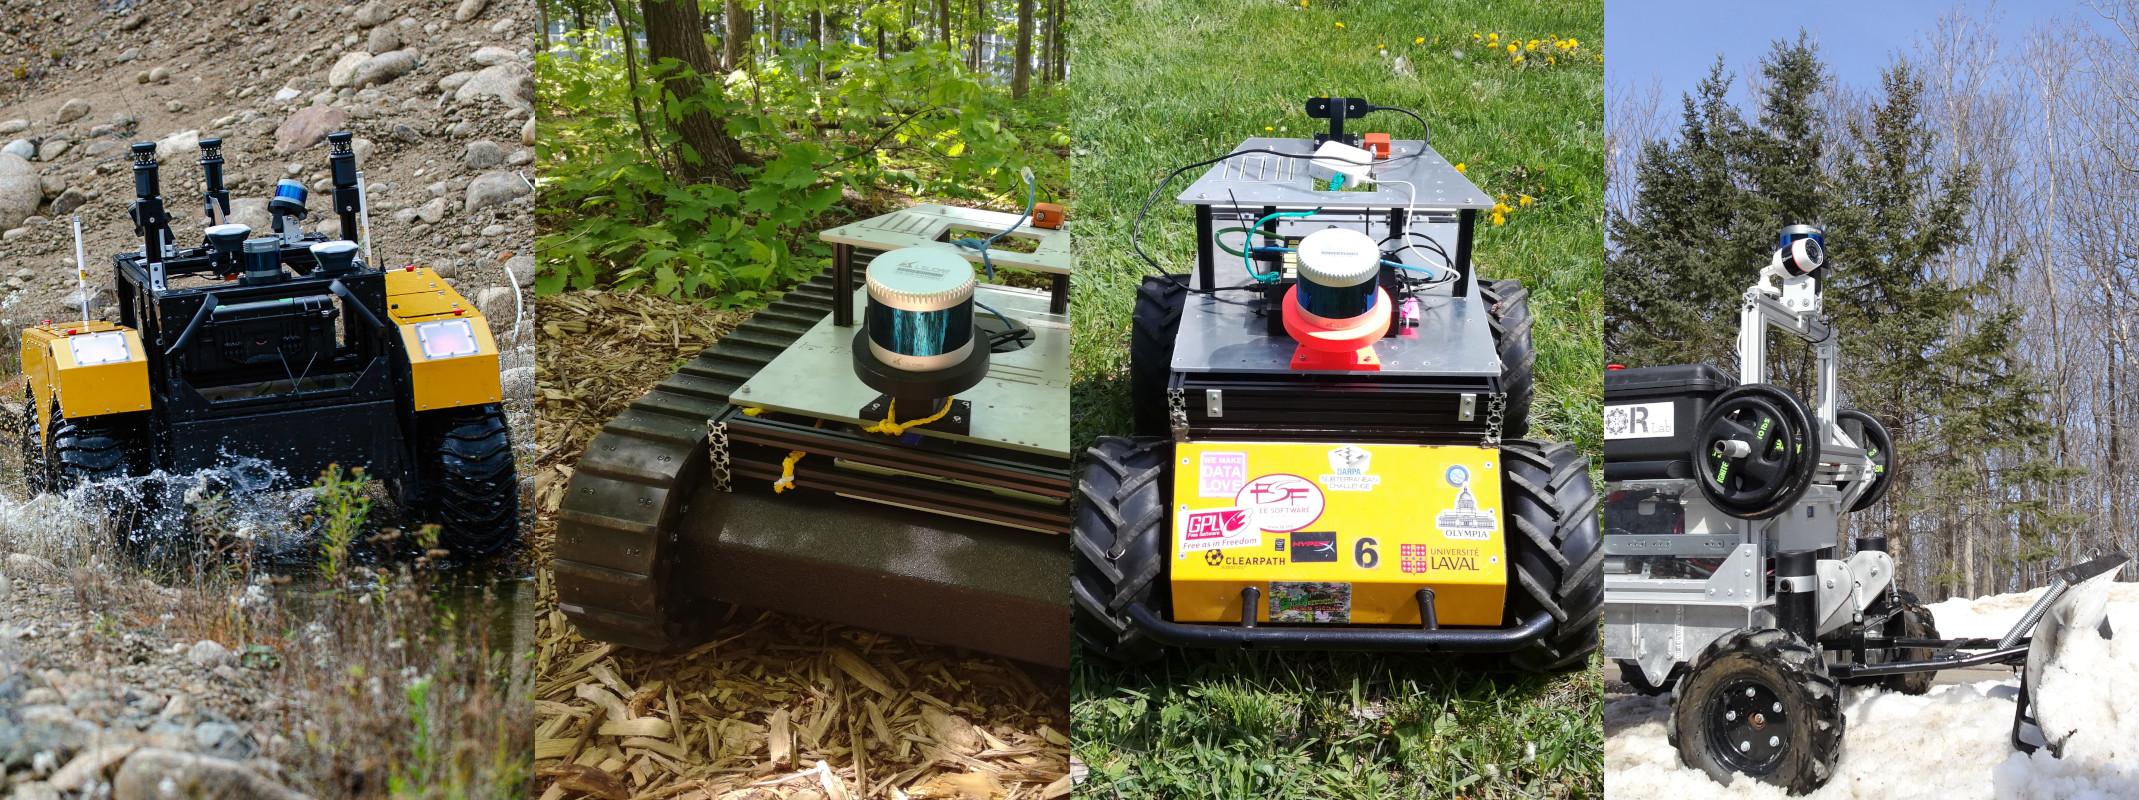 Norlab robots